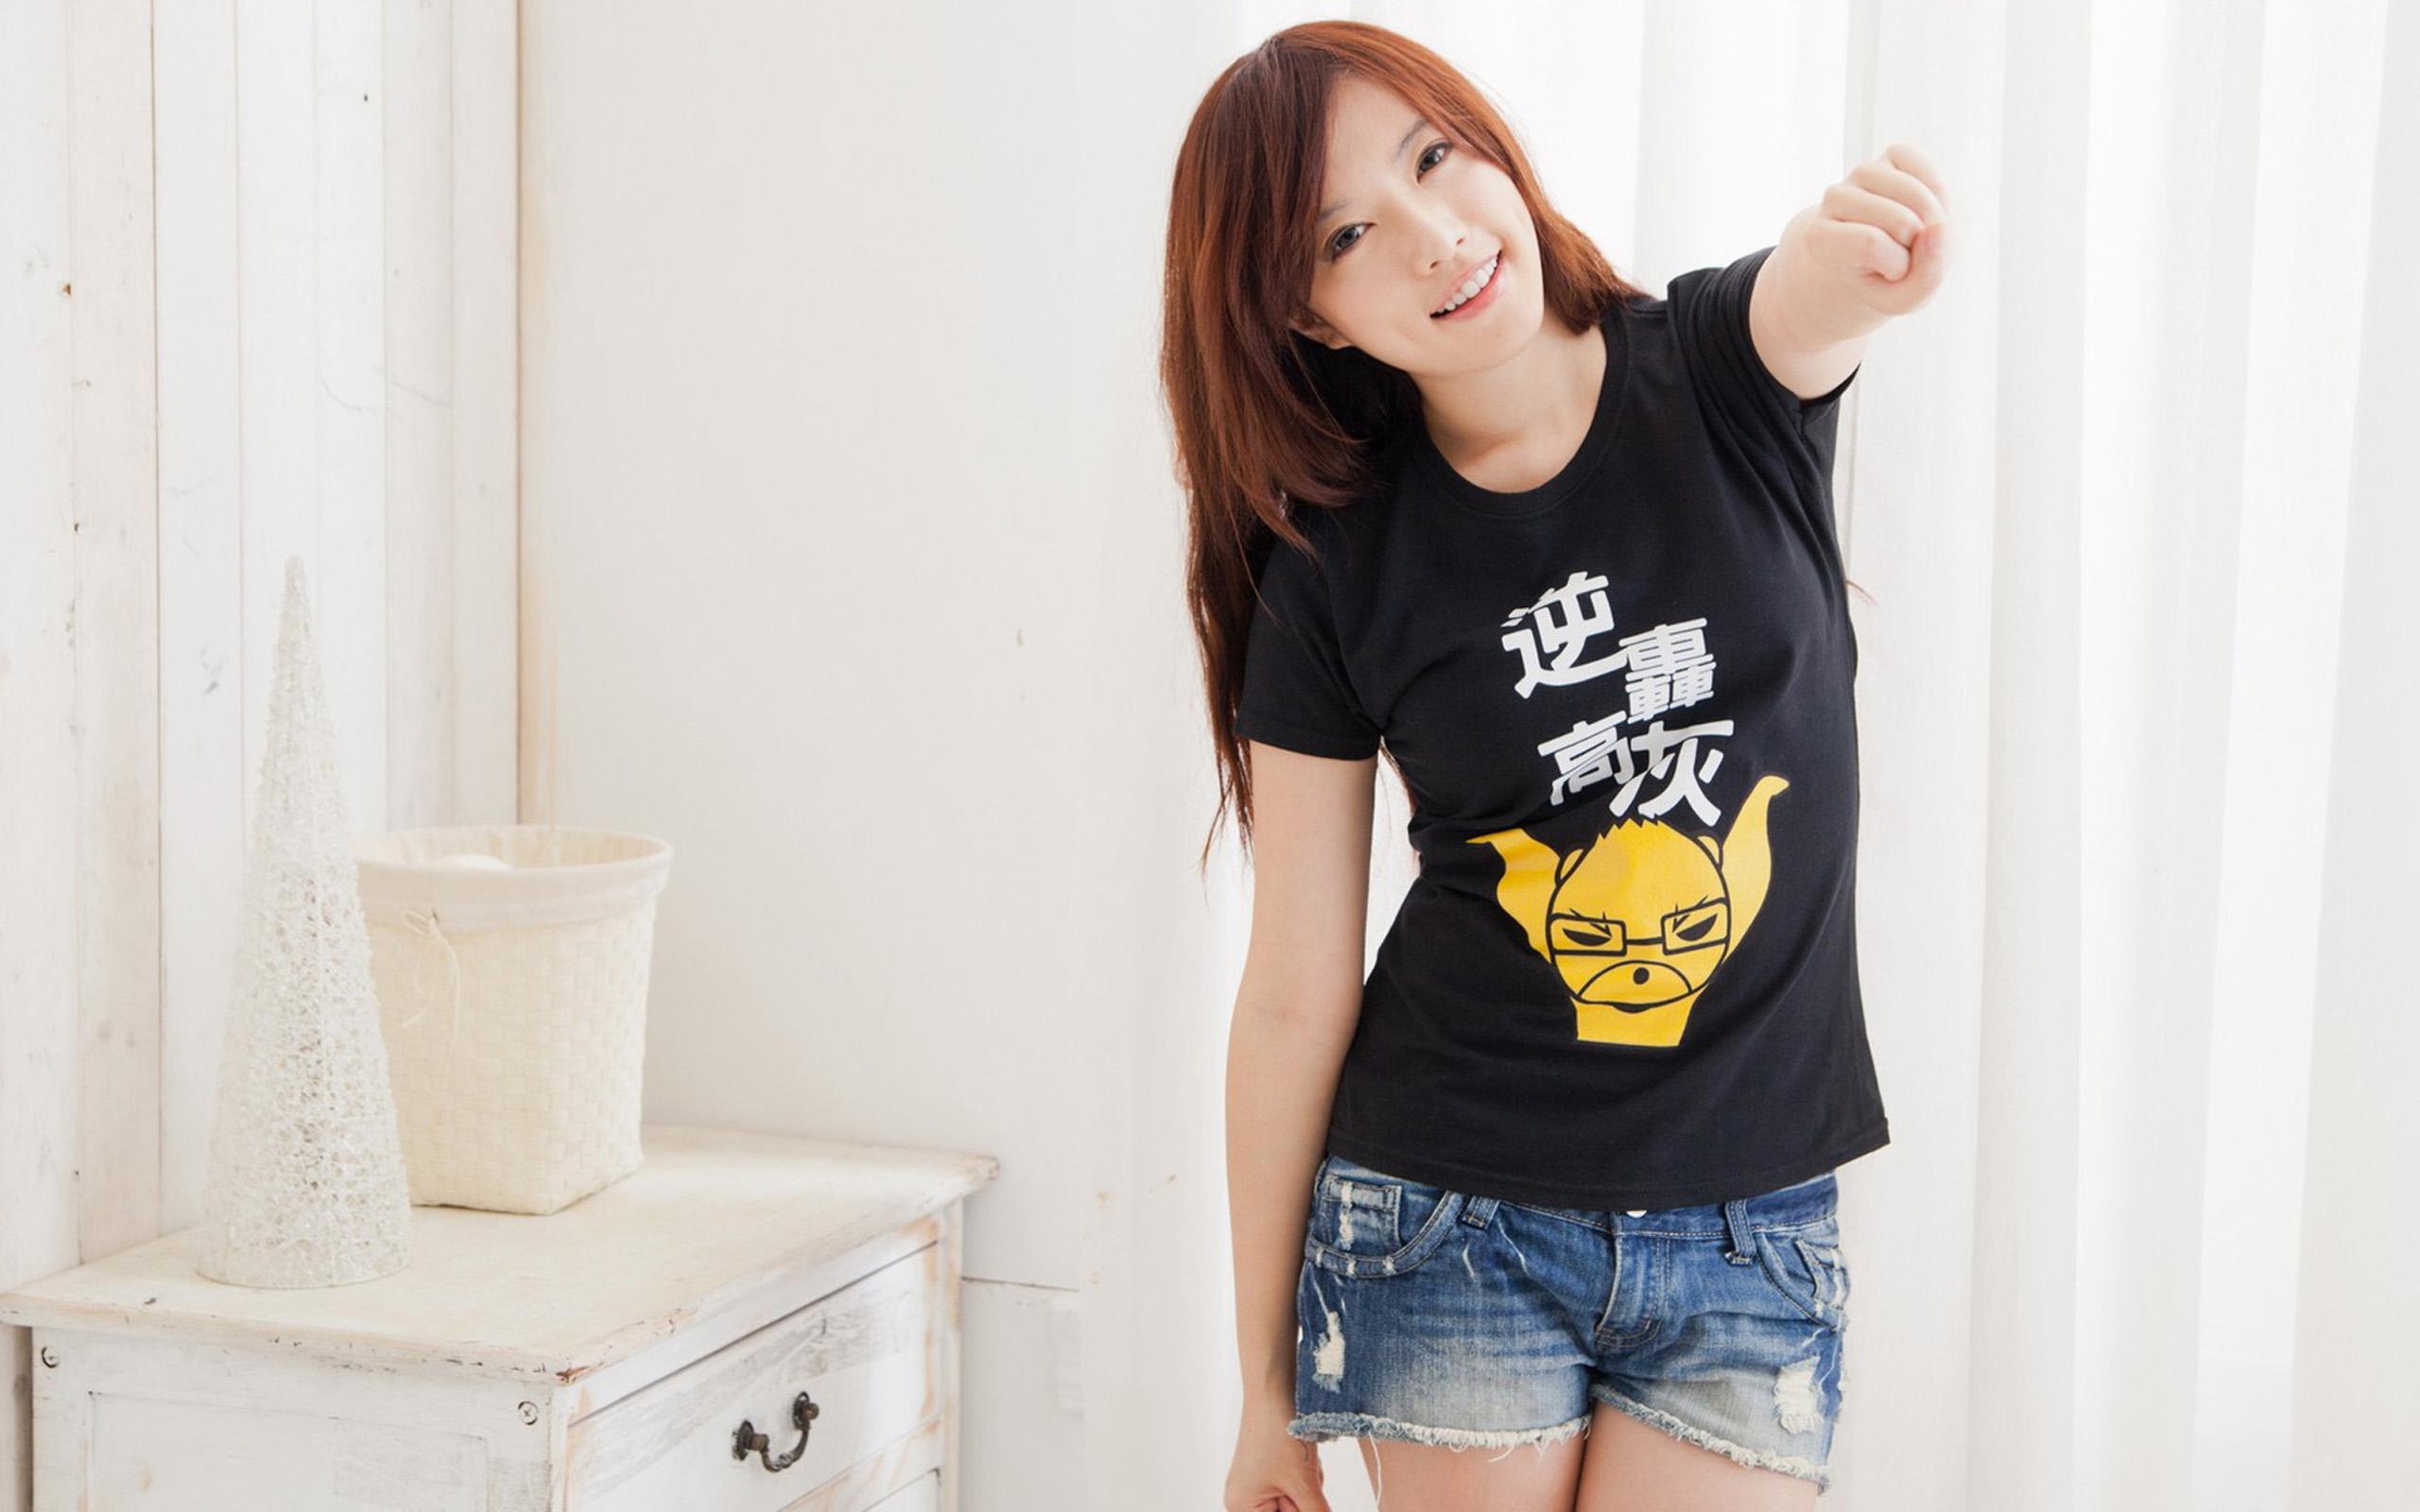 Stylish Asian Girls HD Wallpapers One HD Wallpaper 2560x1600